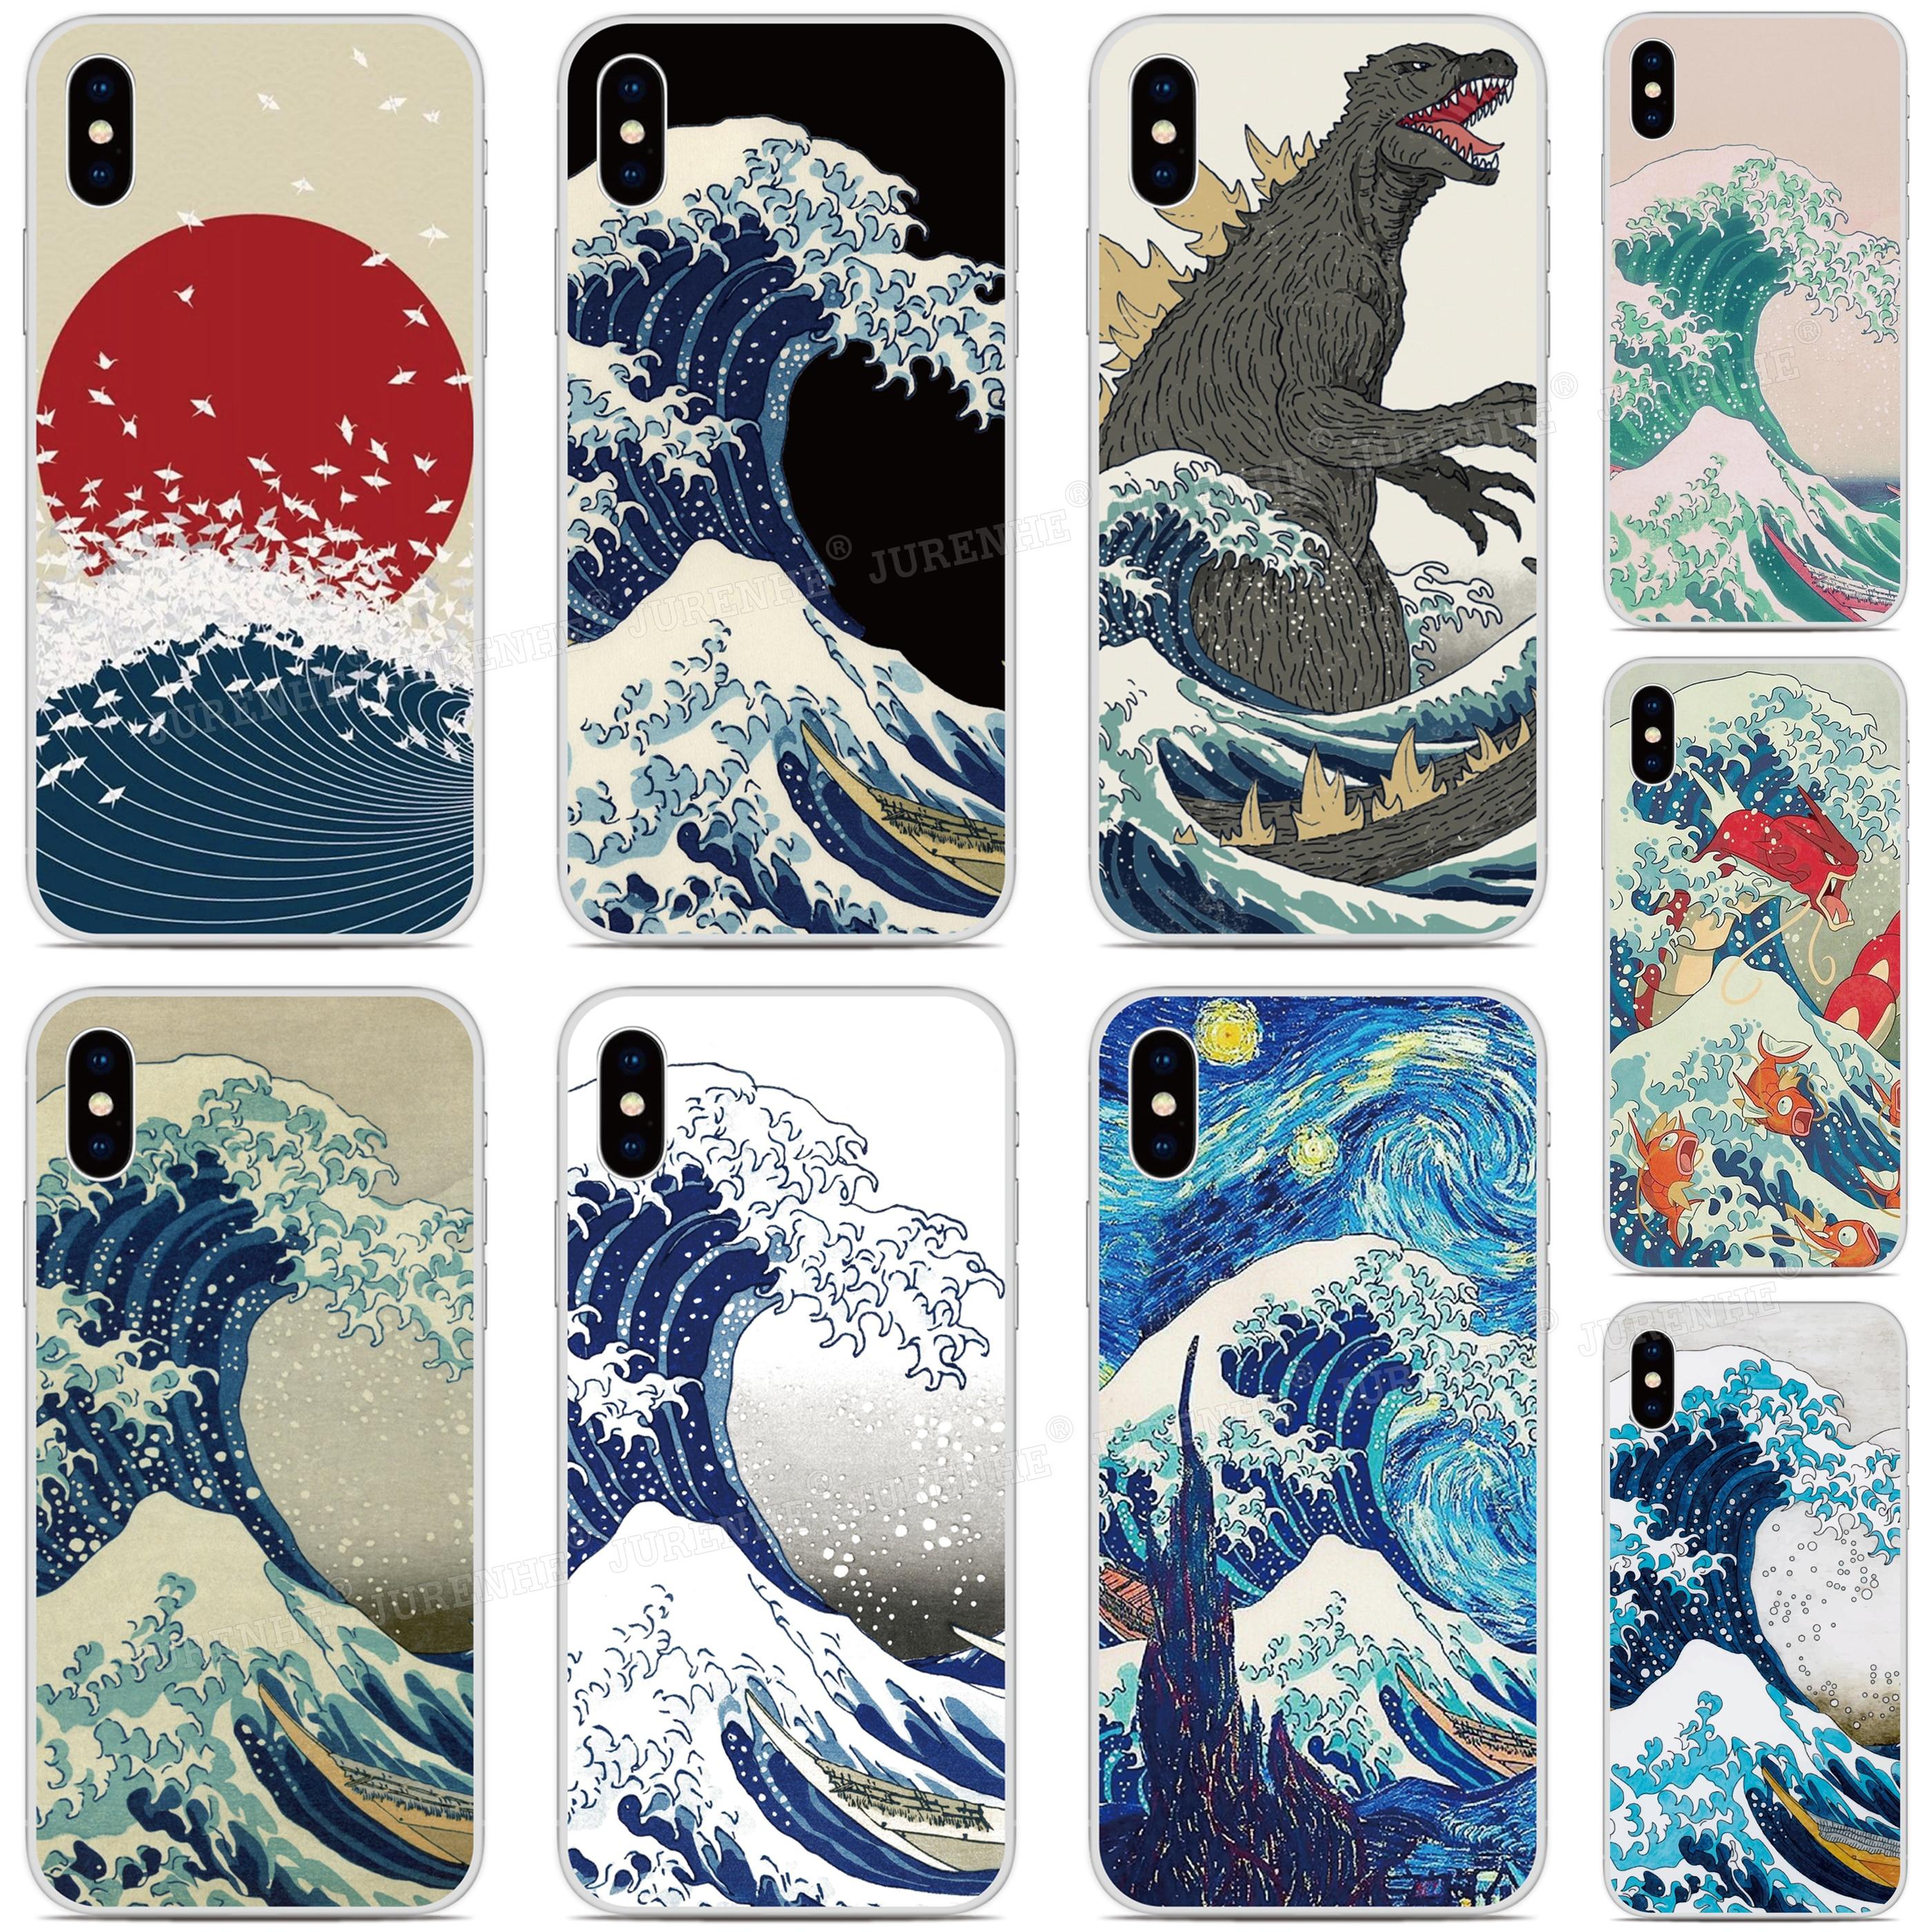 2019 Funda Wave Off Kanagawa Silicone Soft TPU Phone Case For LG K50s K40s K20 K30 K40 K50 Q60 X2 G8X G8S Thinq W10 W30 Cover